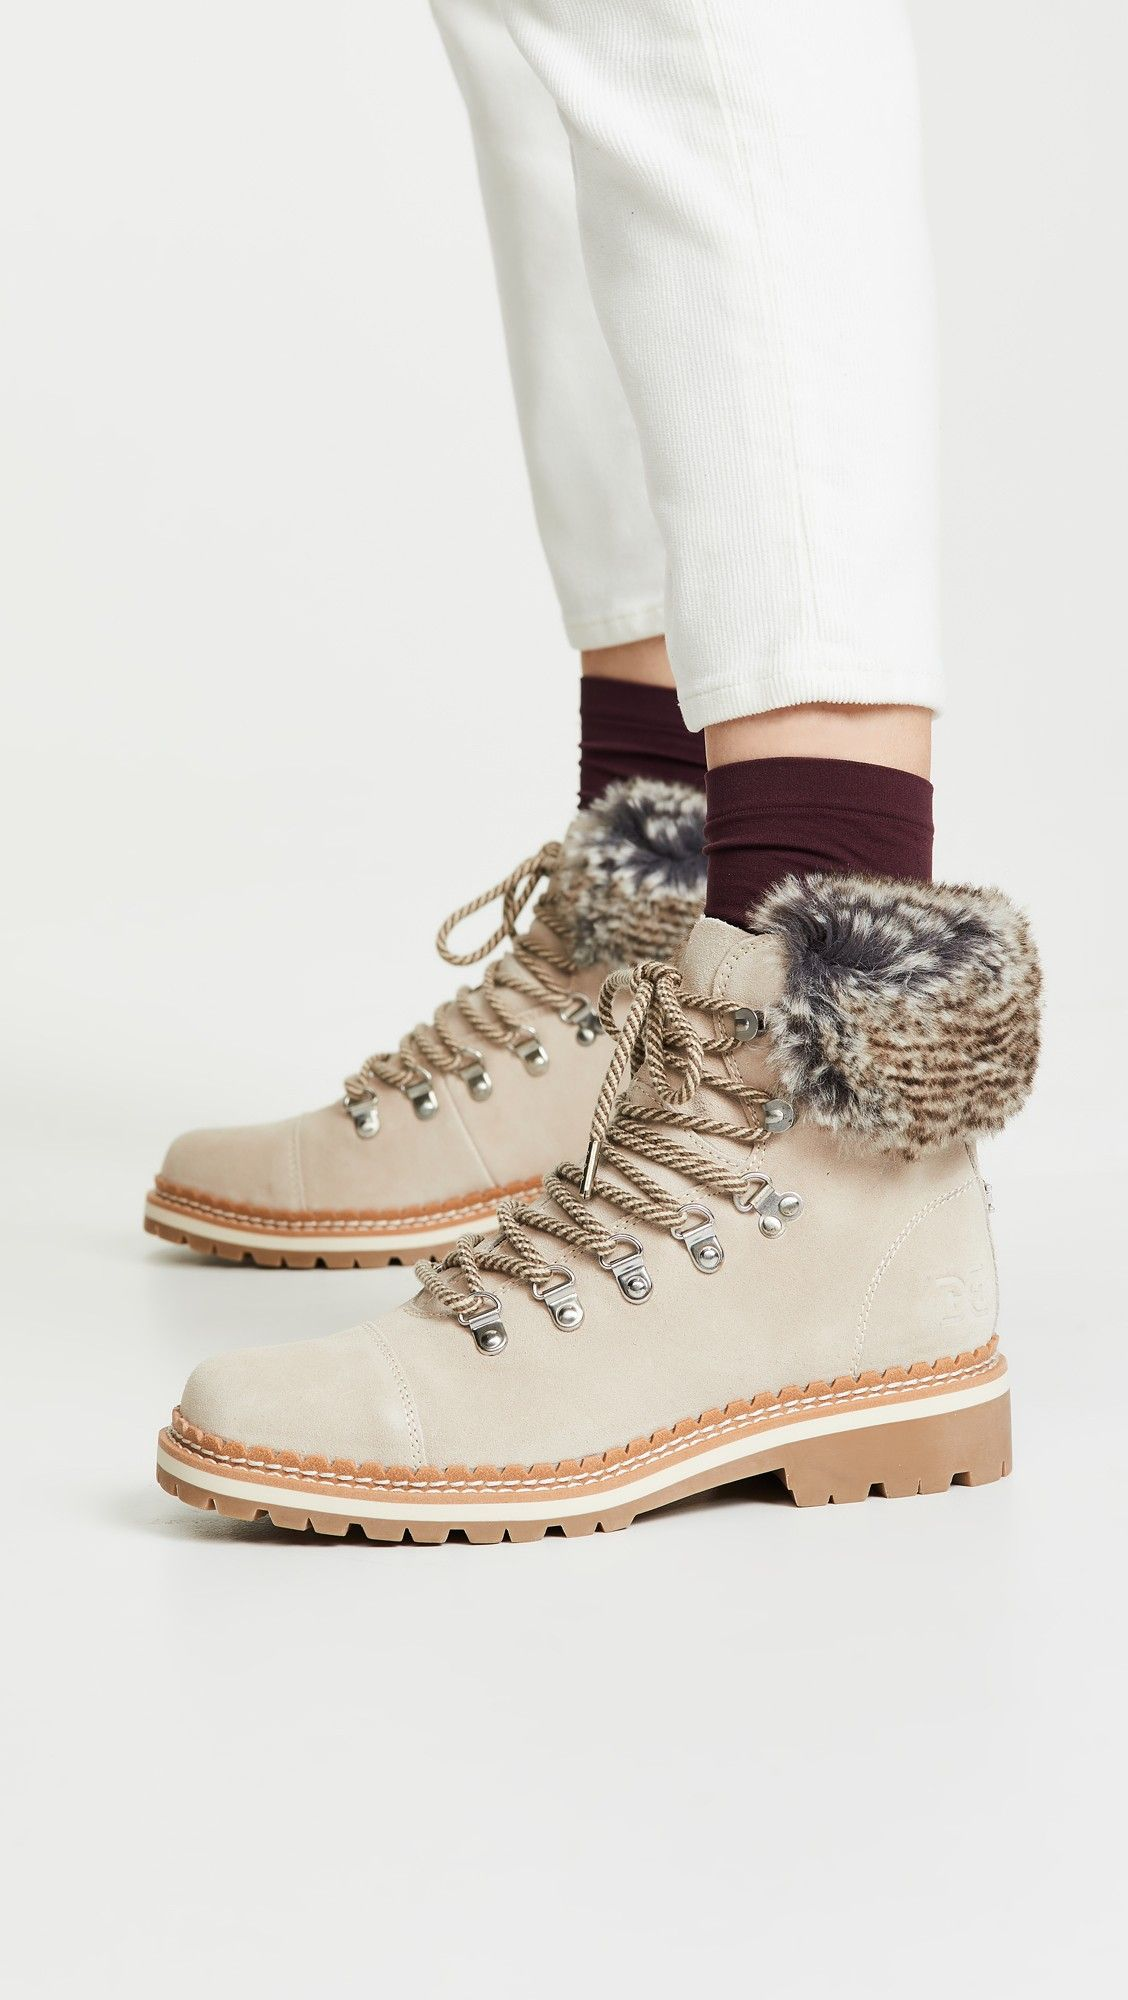 a38023a50 Sam Edelman Bowen Boots